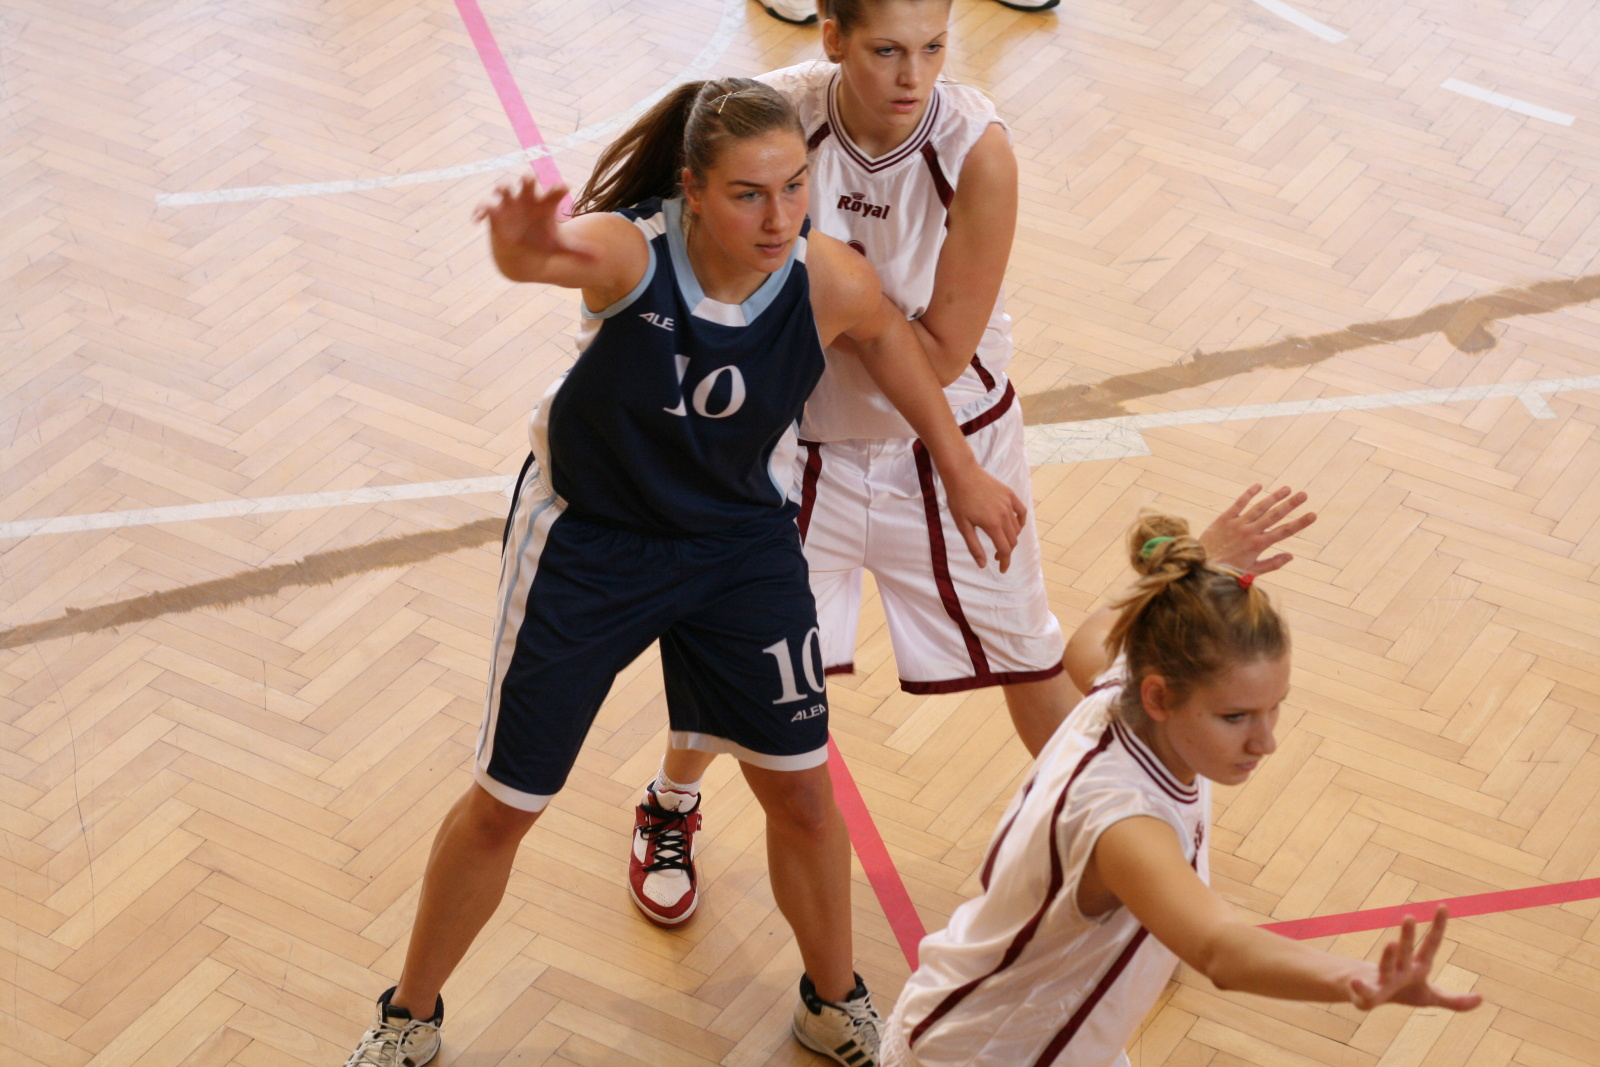 bk-zs-zvolen-bk-petrzalka-basketbal-juniorky-10